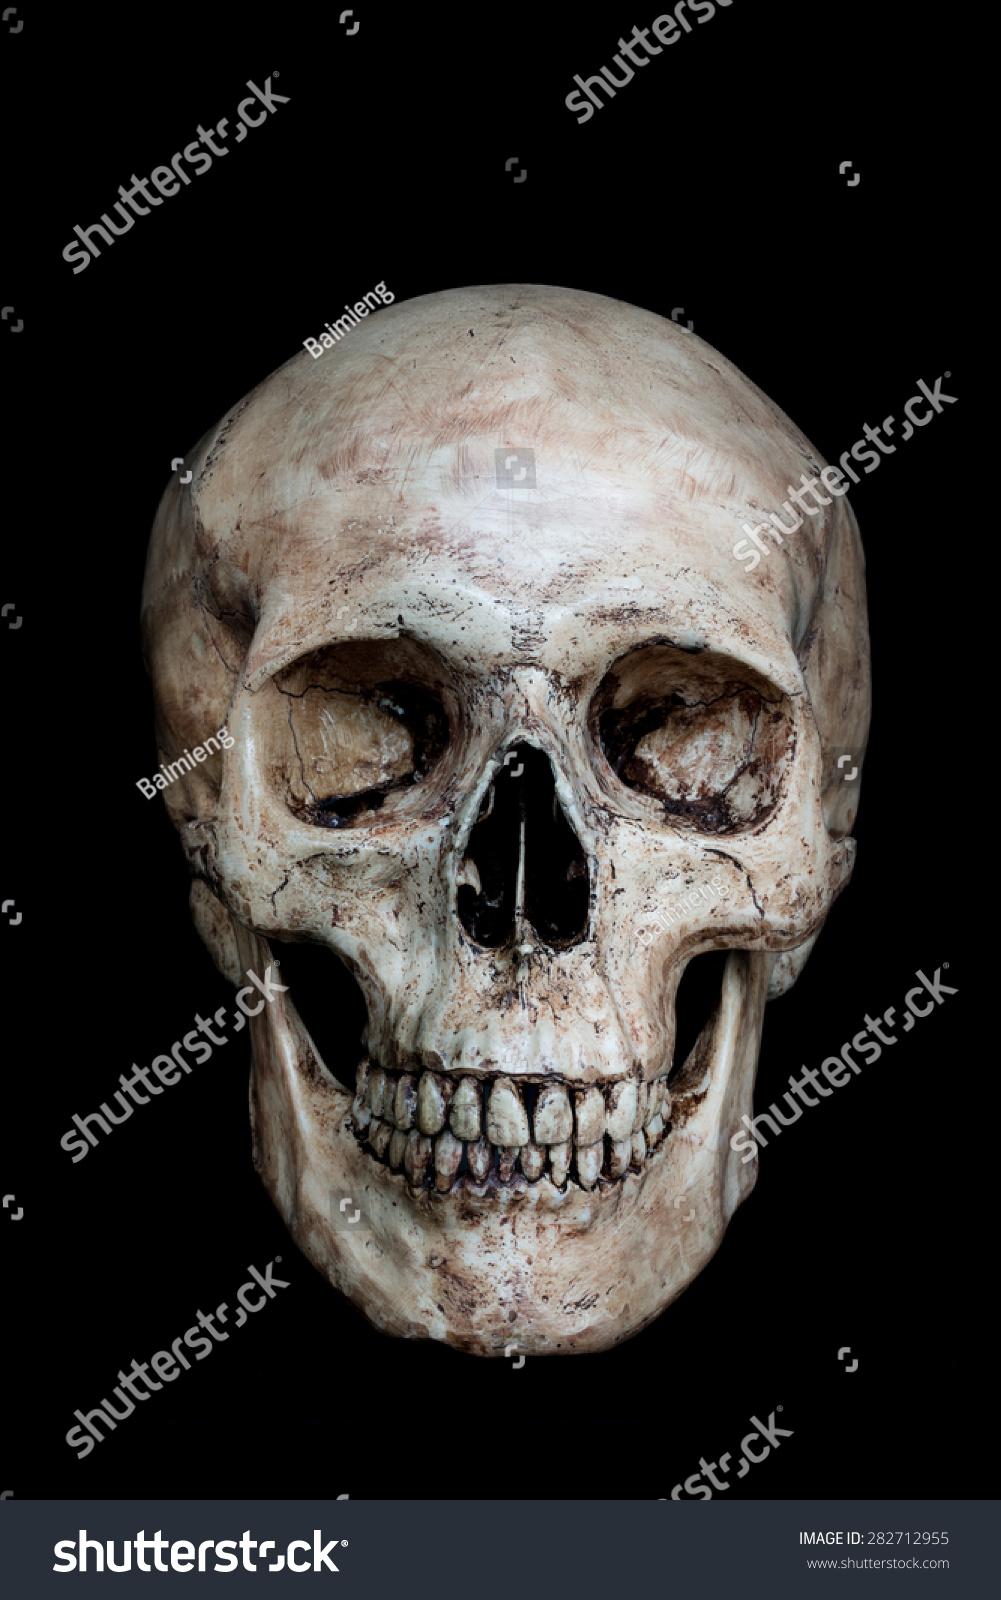 Human Skull Front View Hd